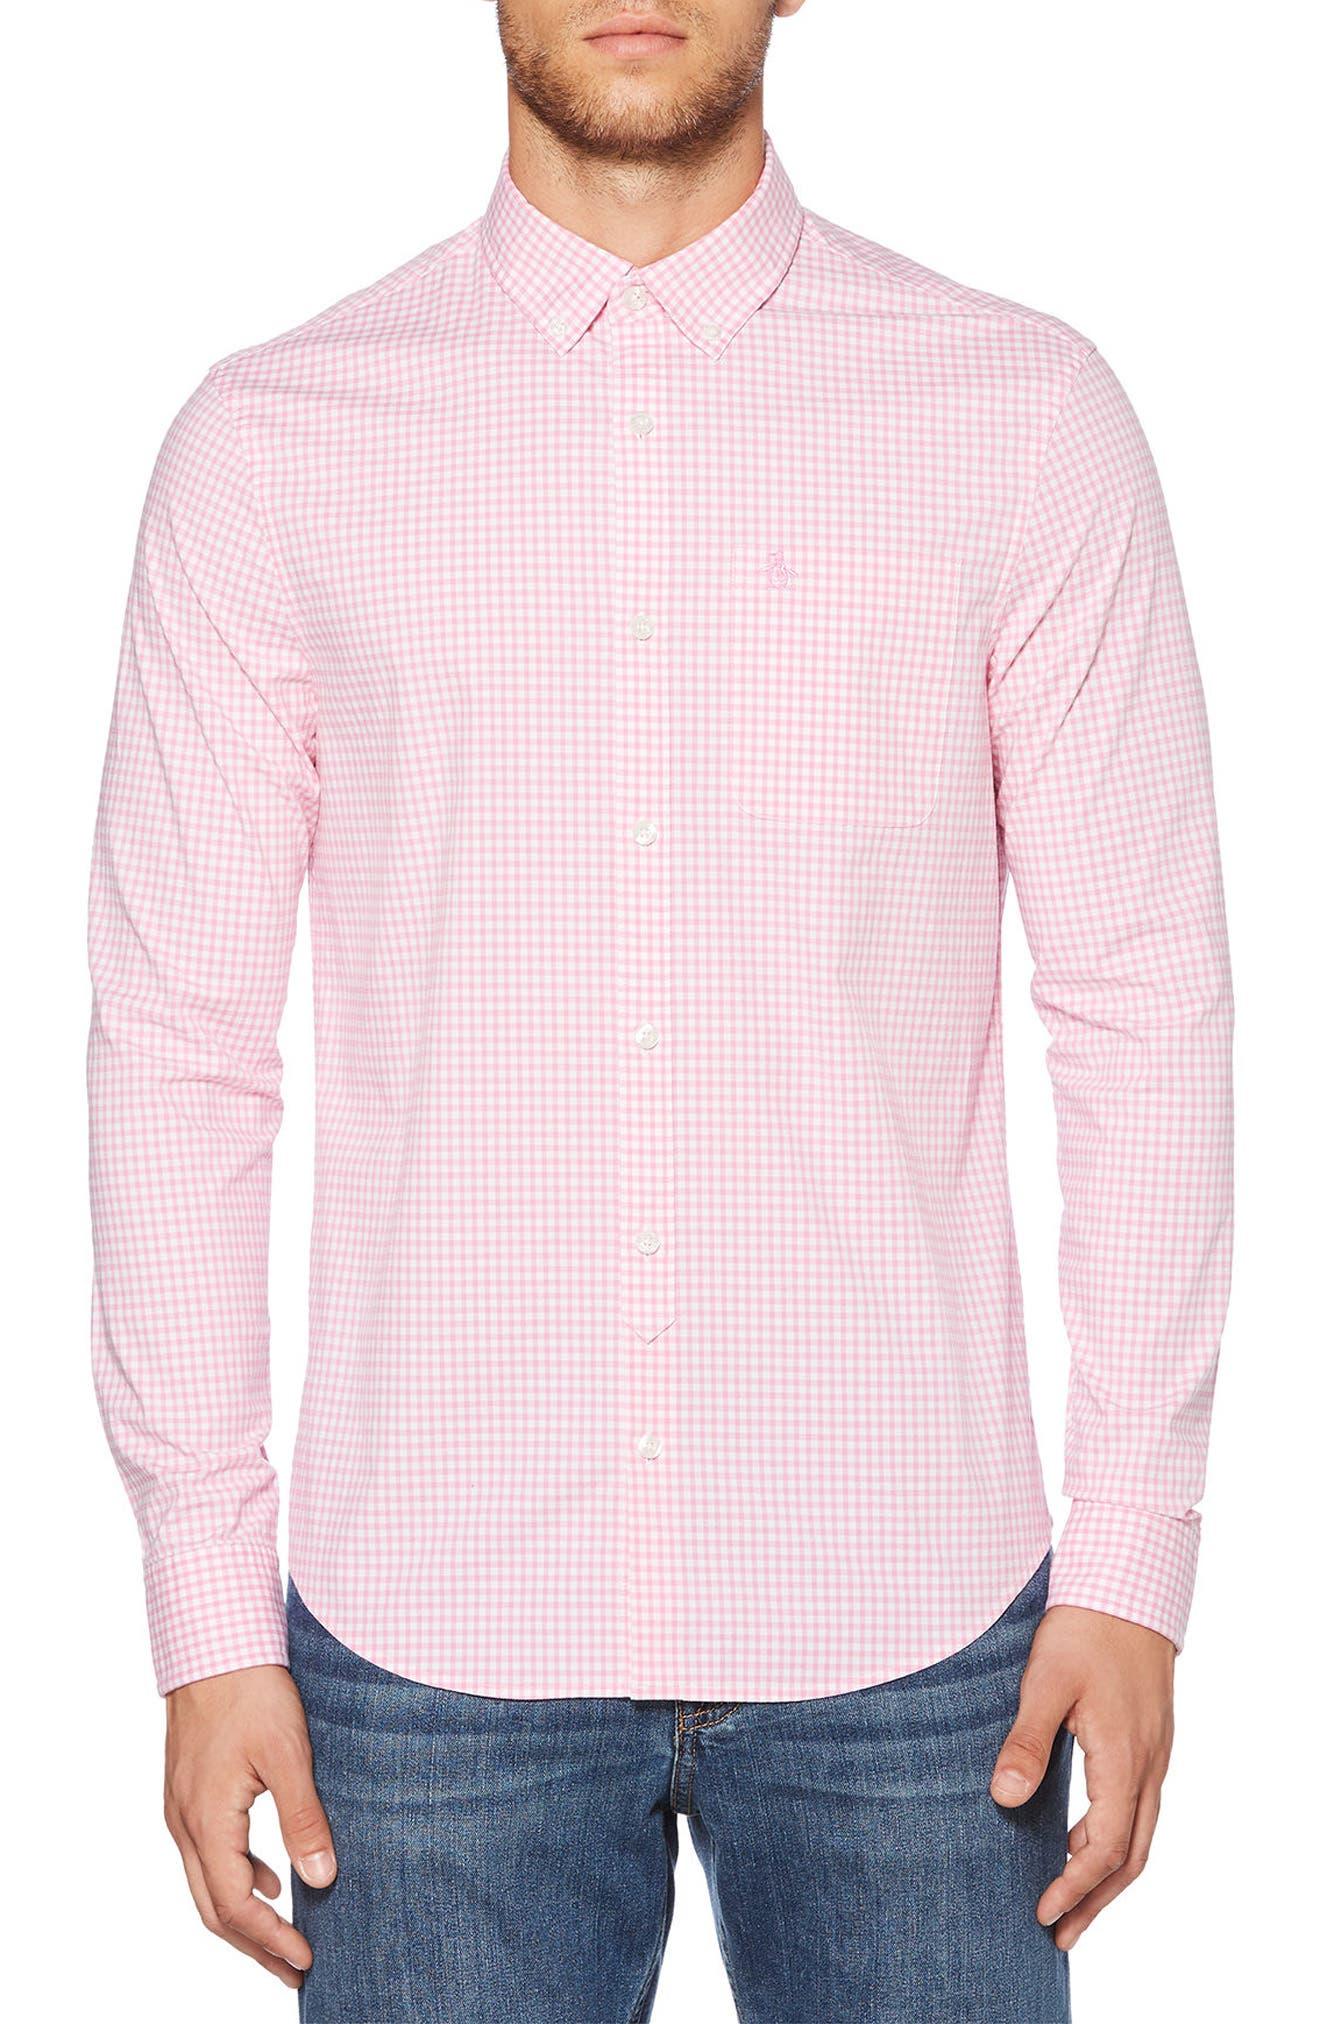 Gingham Shirt,                             Main thumbnail 1, color,                             Fuchsia Pink